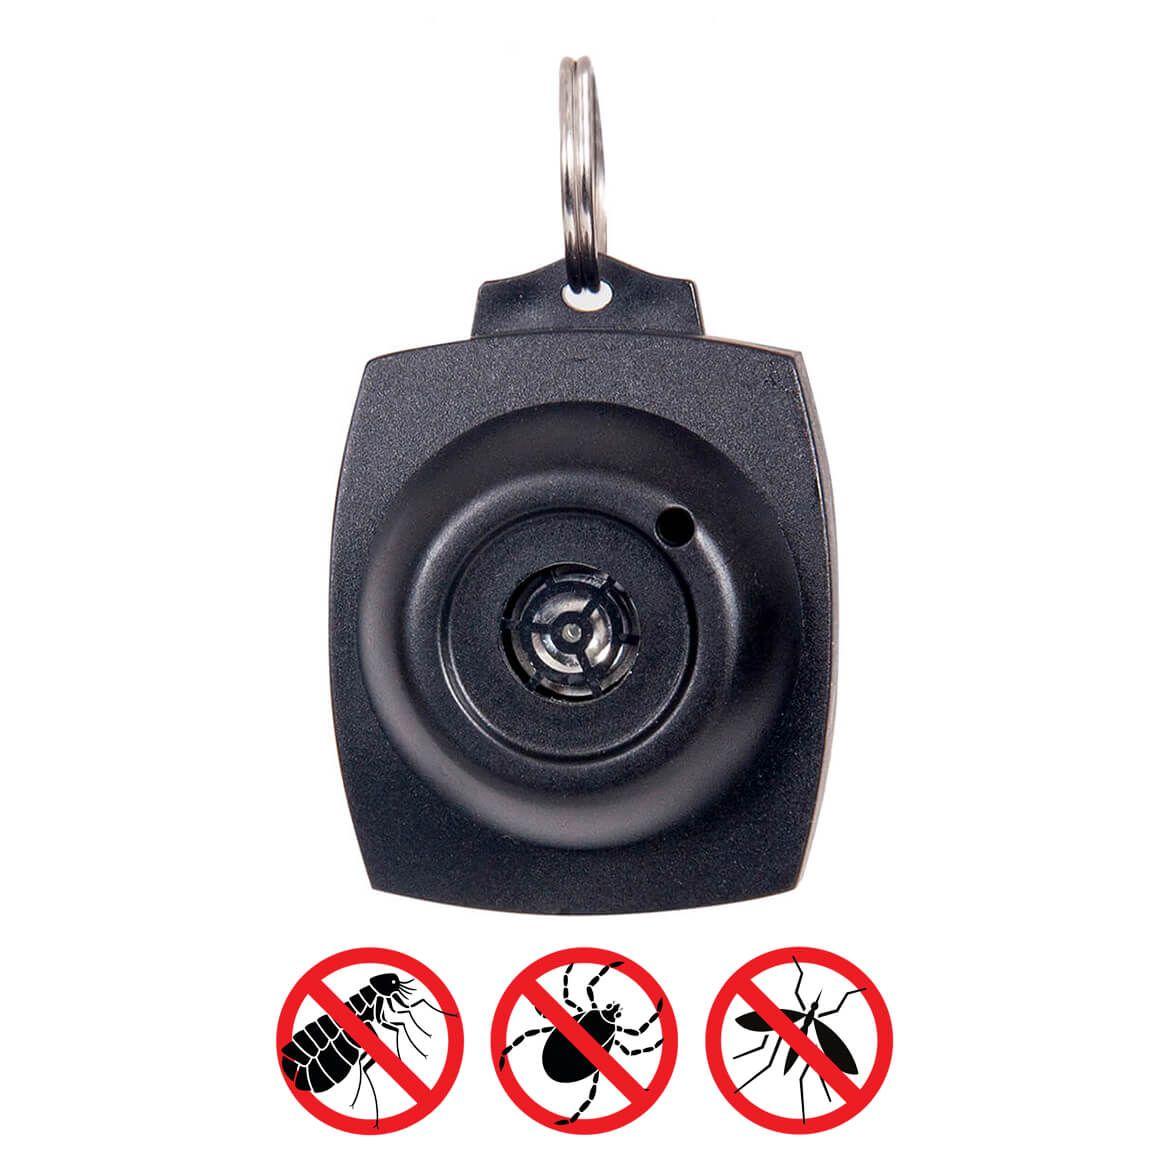 Ultrasonic Flea & Tick Repeller-371651